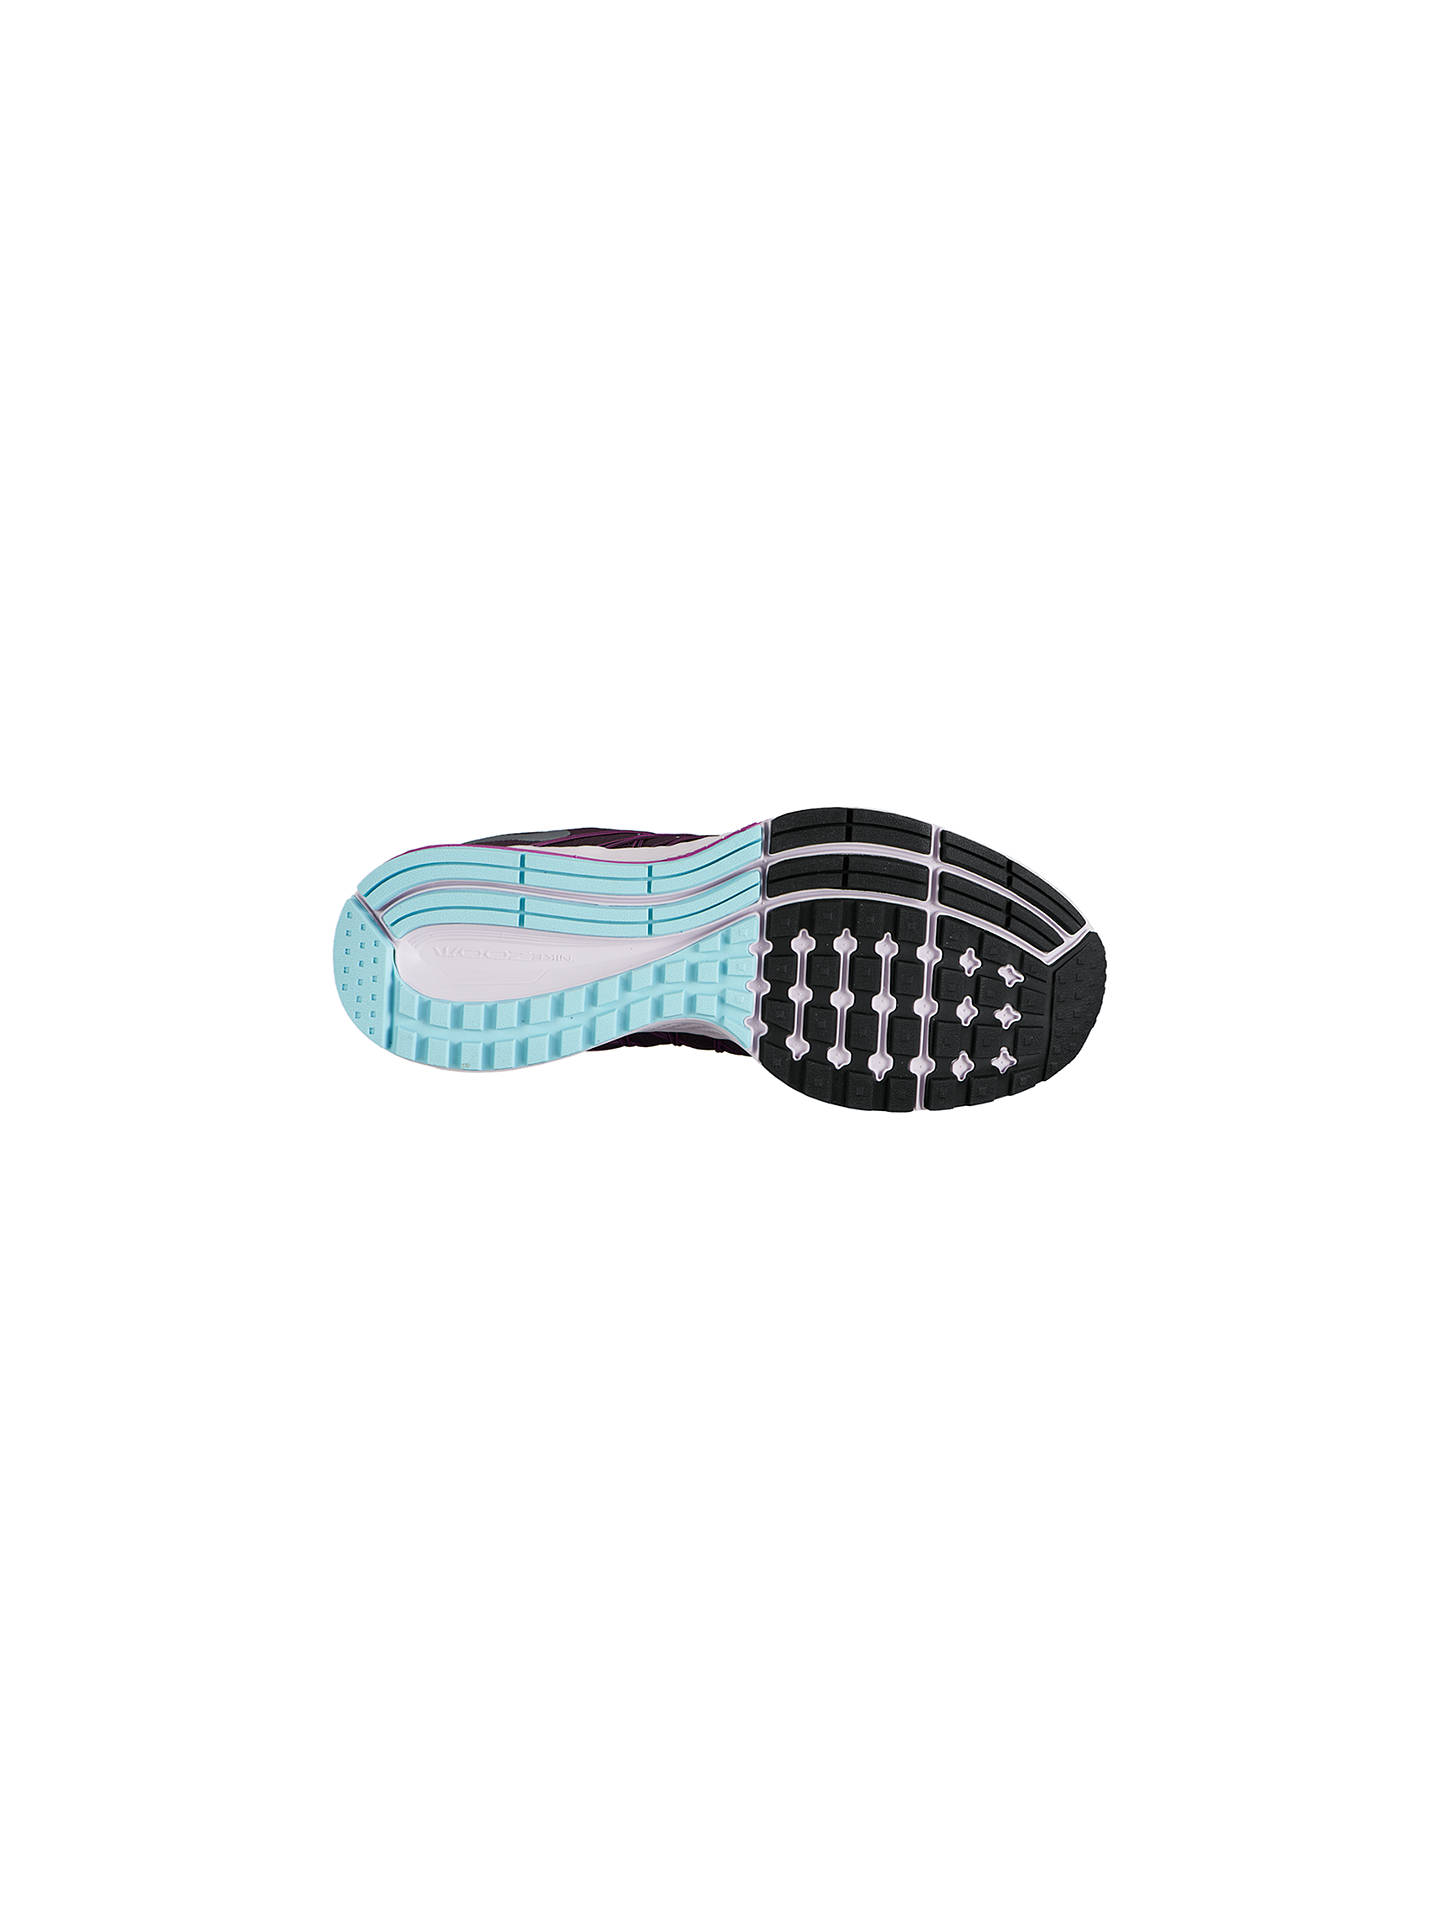 ... BuyNike Air Zoom Pegasus 32 Women s Running Shoes 550b700d5